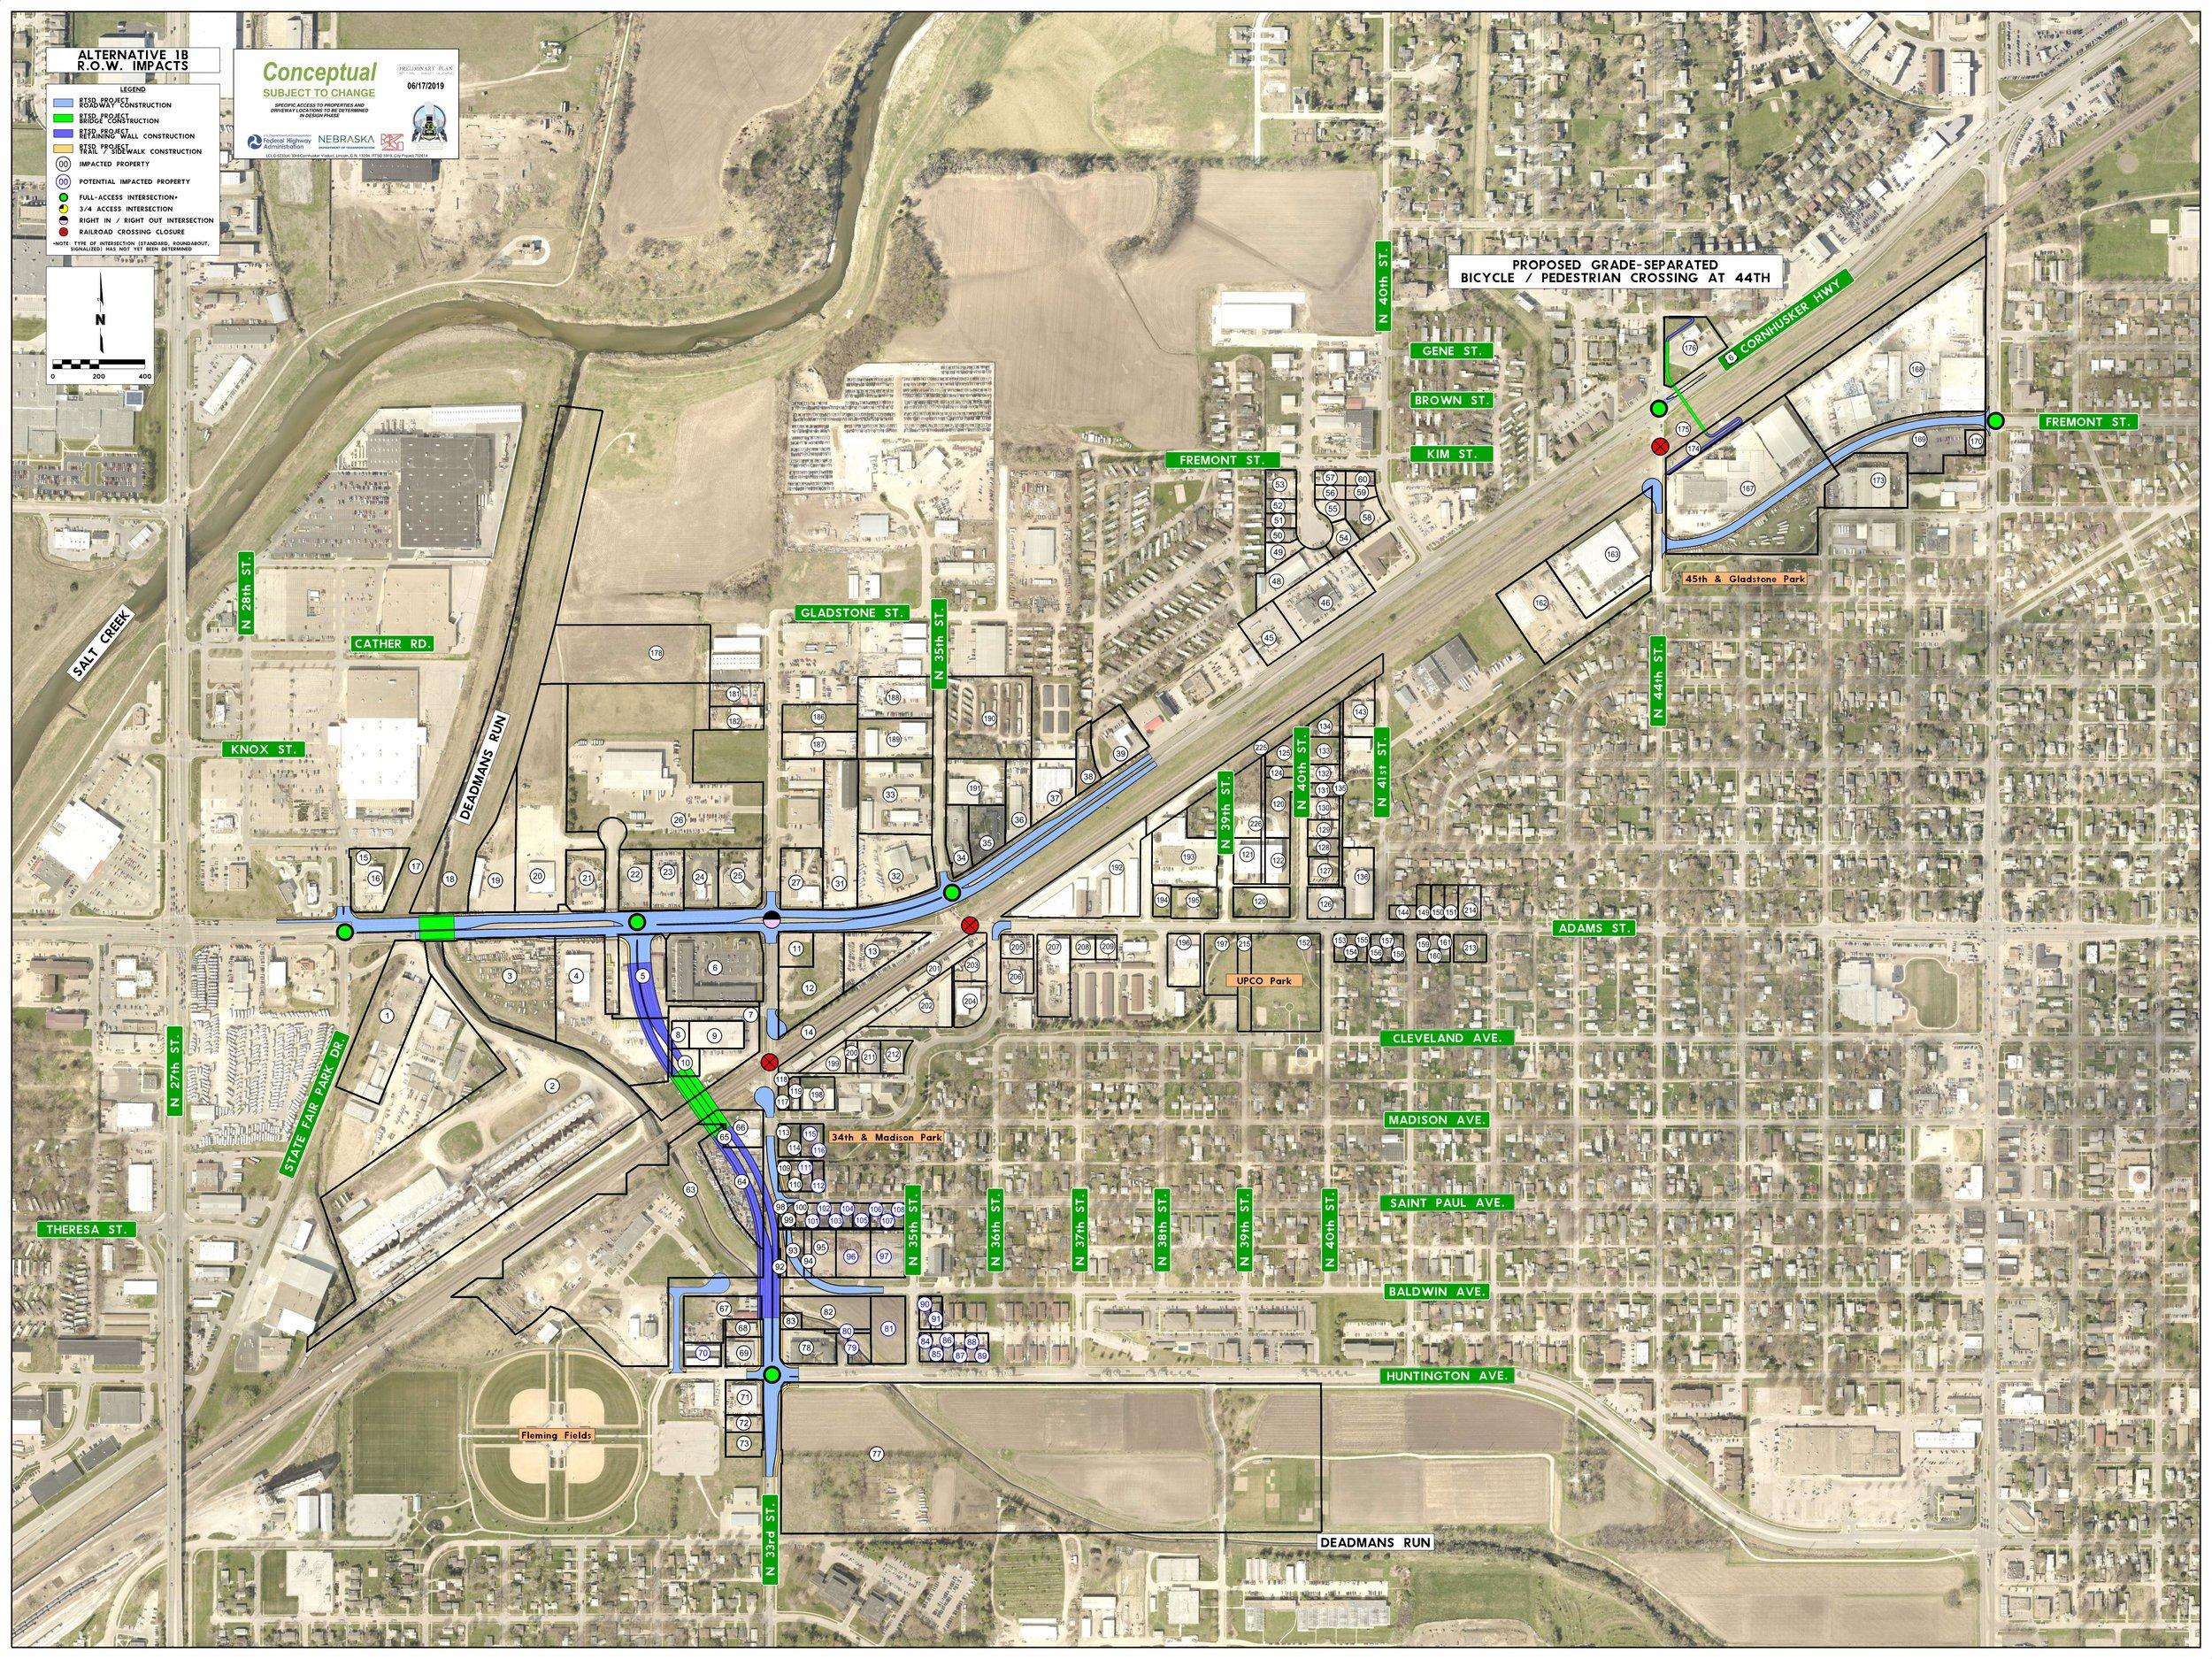 19-06-17_702614_33rd & Corn - ROW Impact Map 200 Scale_1B - Reduced.jpg